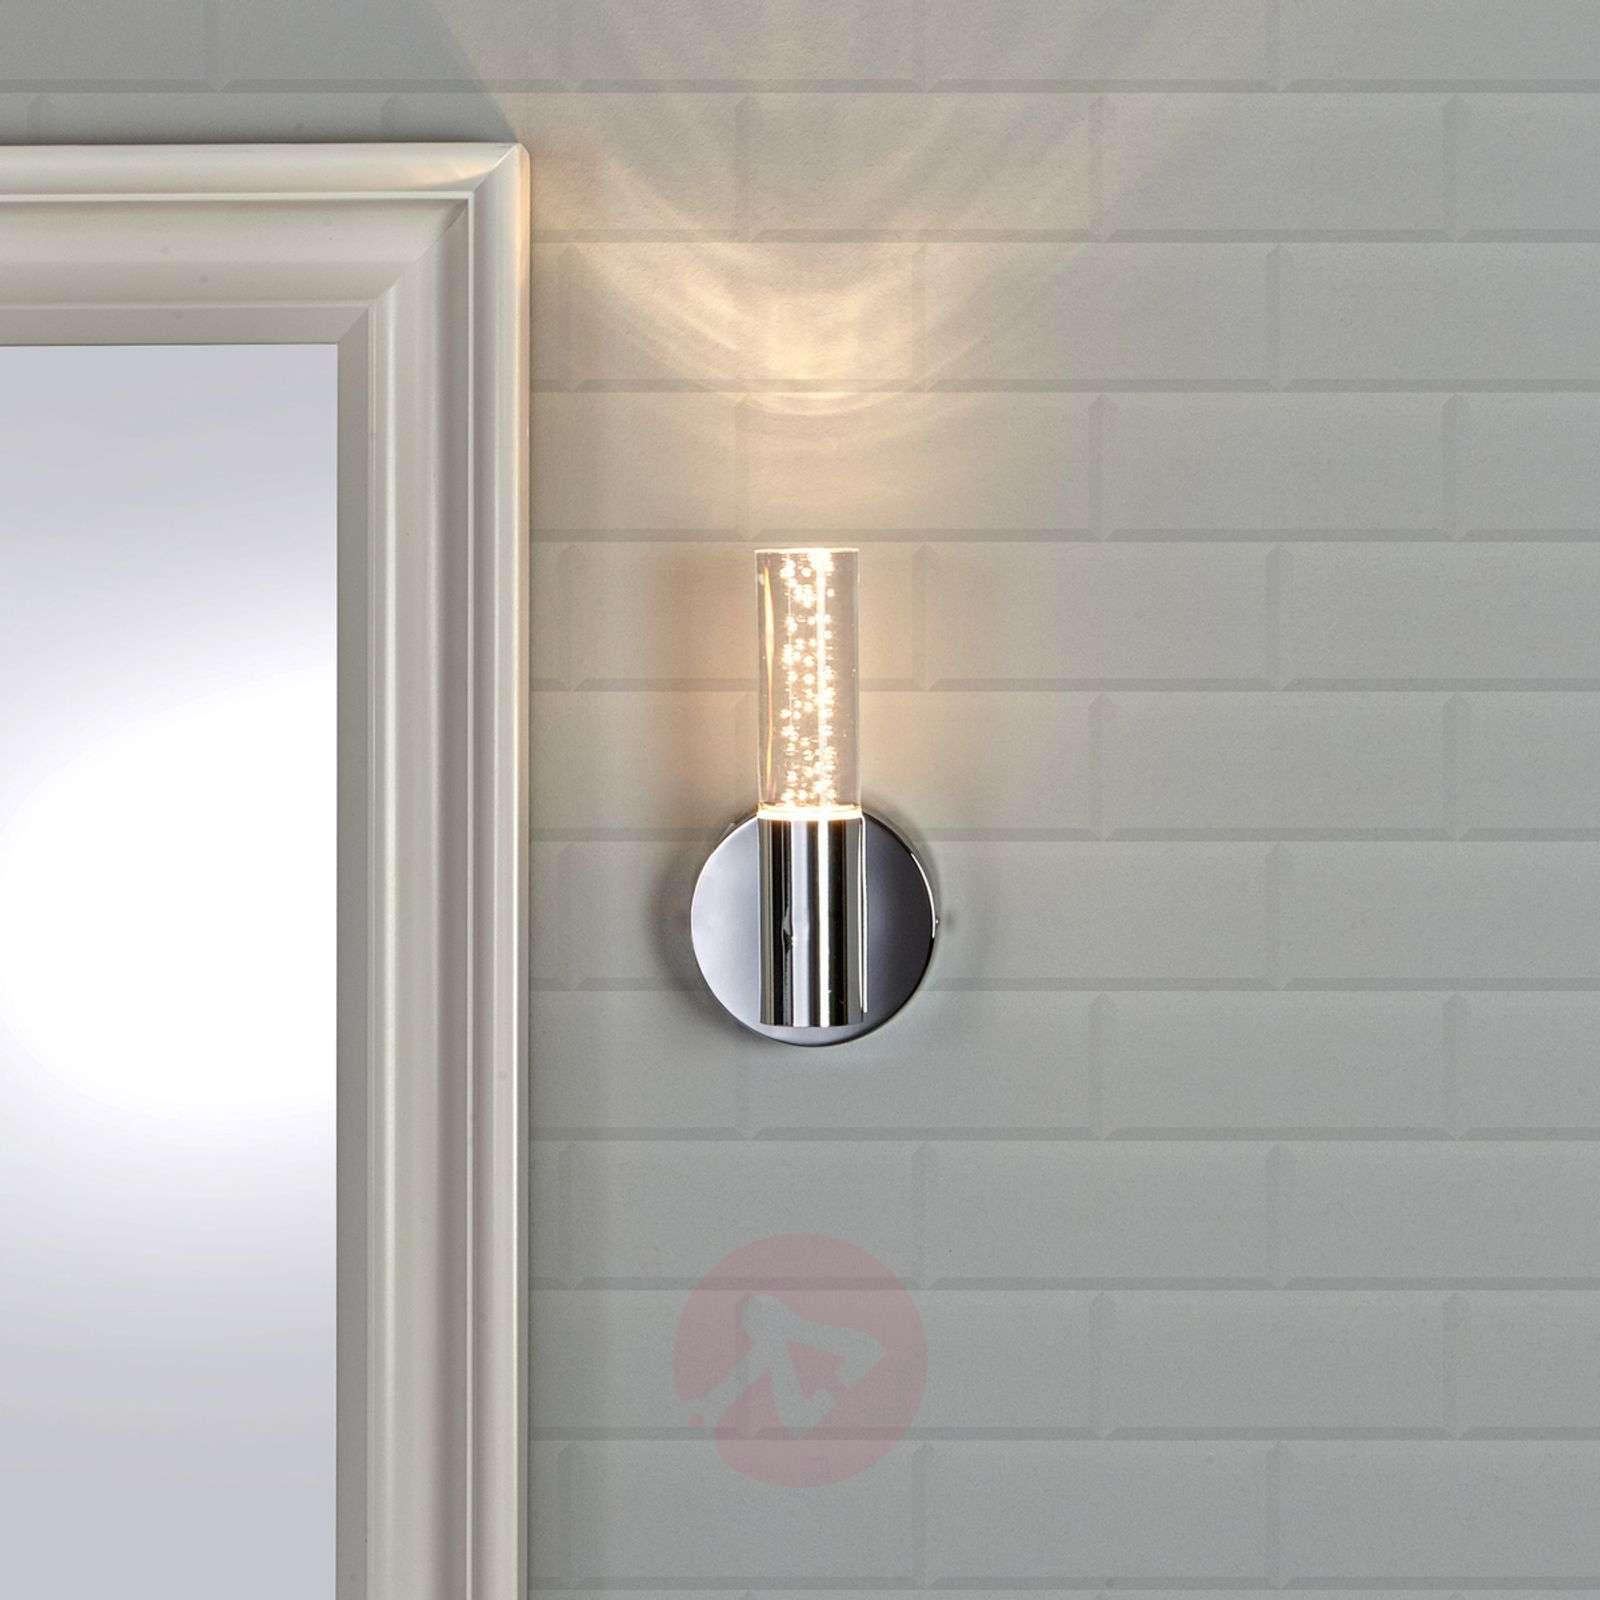 Duncan decorative bathroom wall light with LED-9994057-03